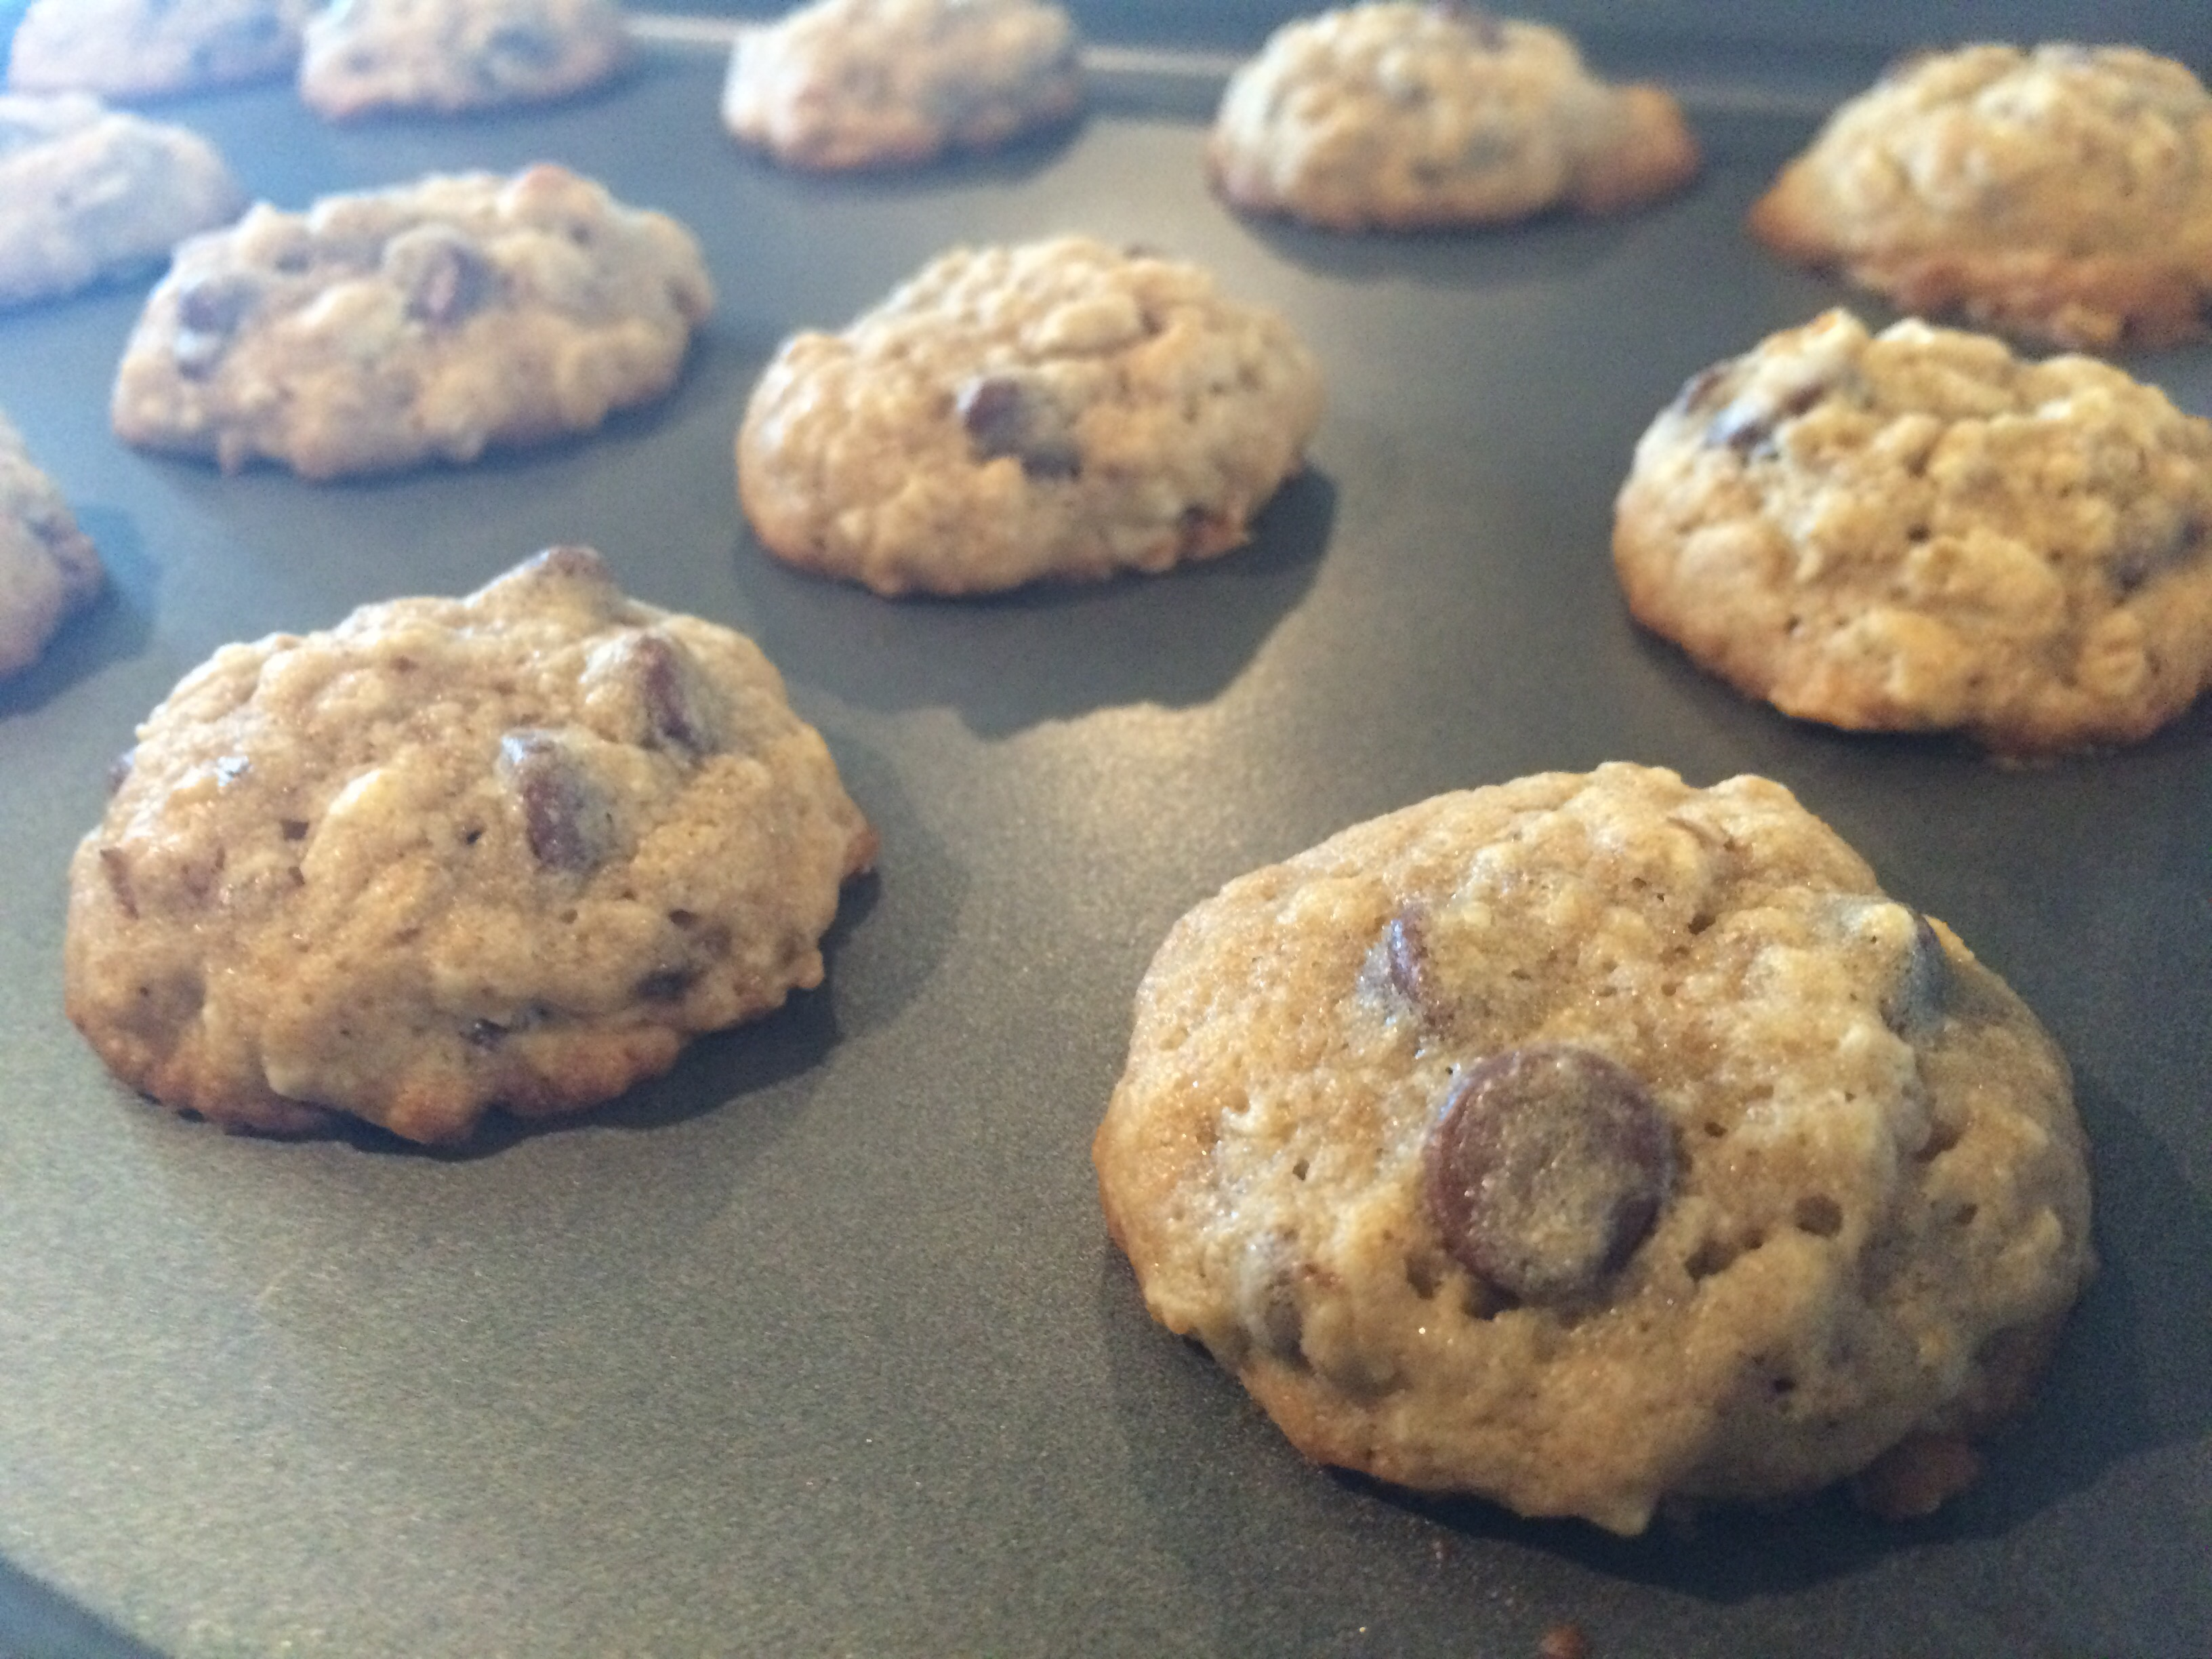 Banana Walnut Chocolate Chip Cookies | fireislandchef